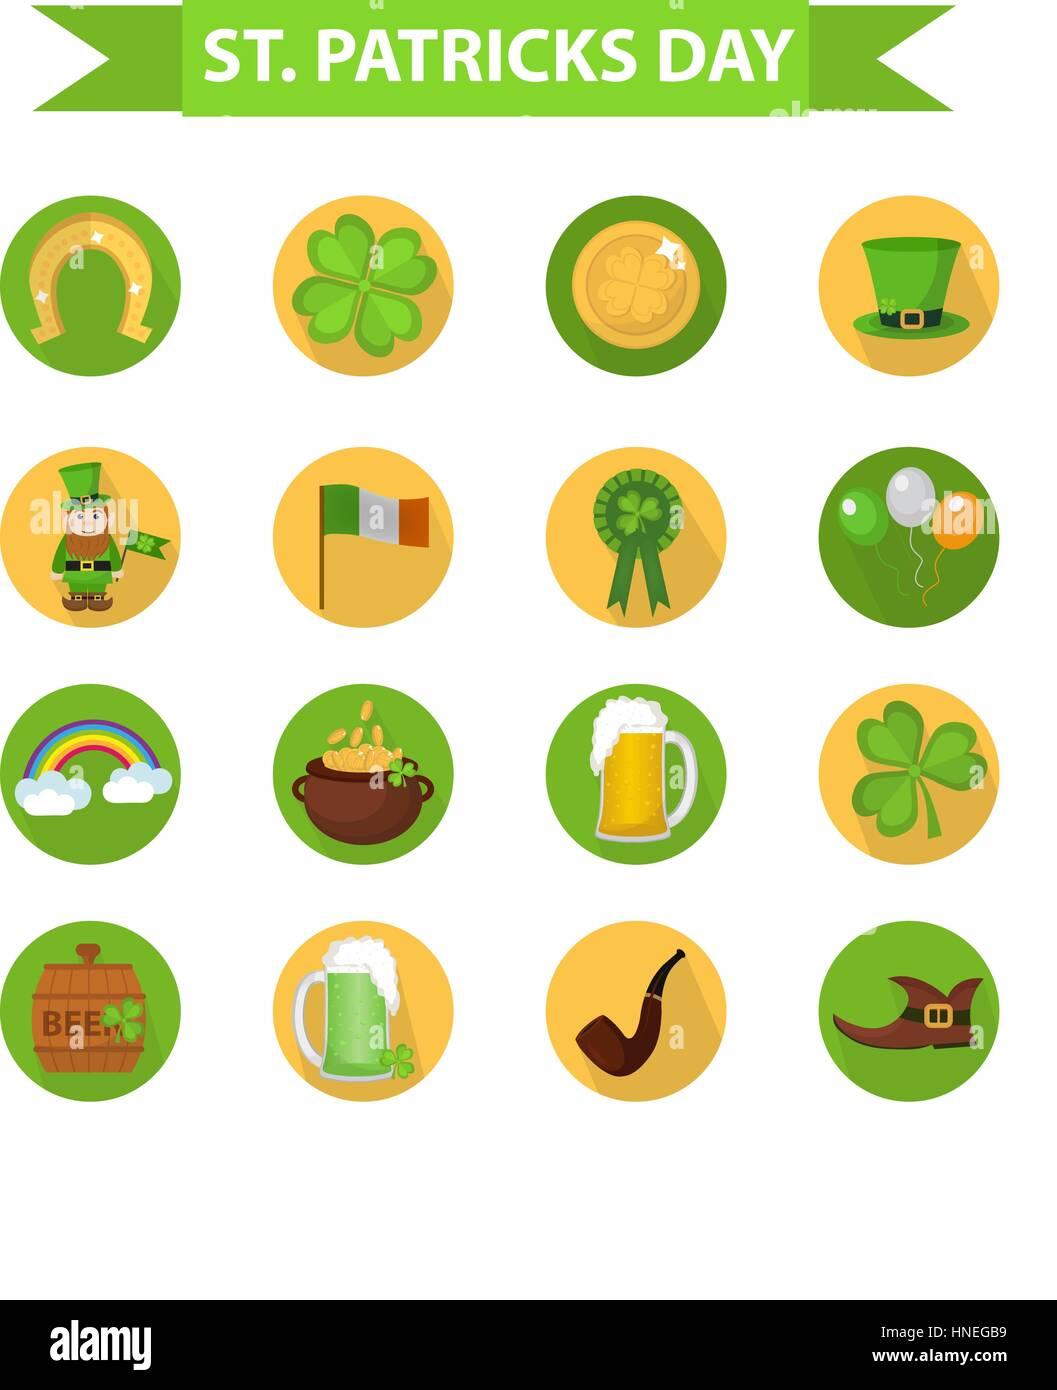 St Patricks Day Icon Set Design Element Traditional Irish Symbols Stock Vector Image Art Alamy